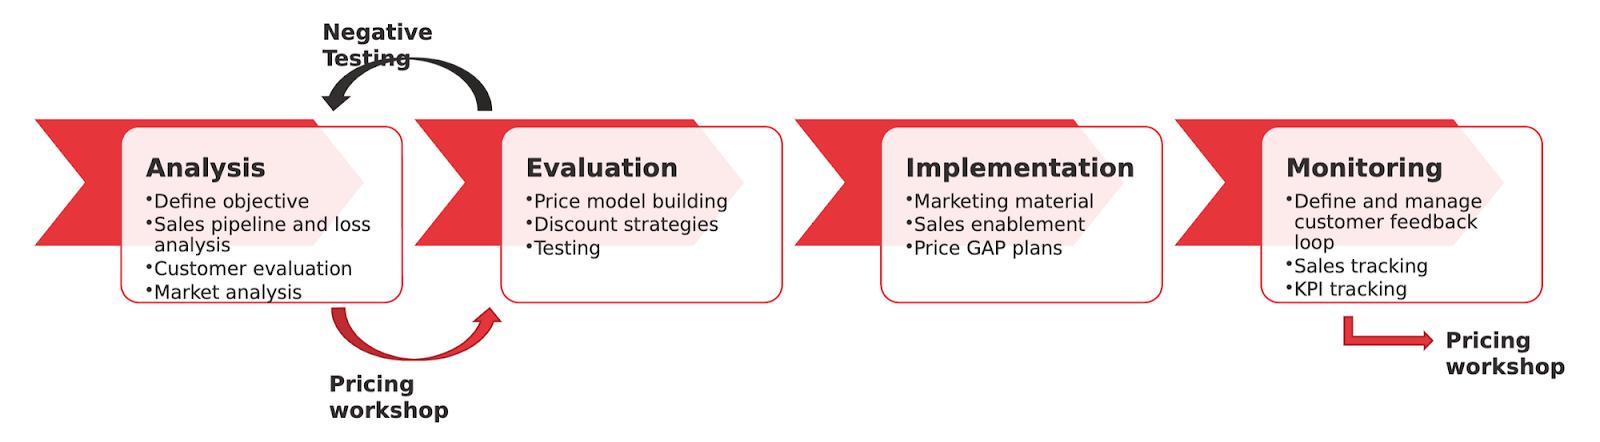 Framework for pricing work streams